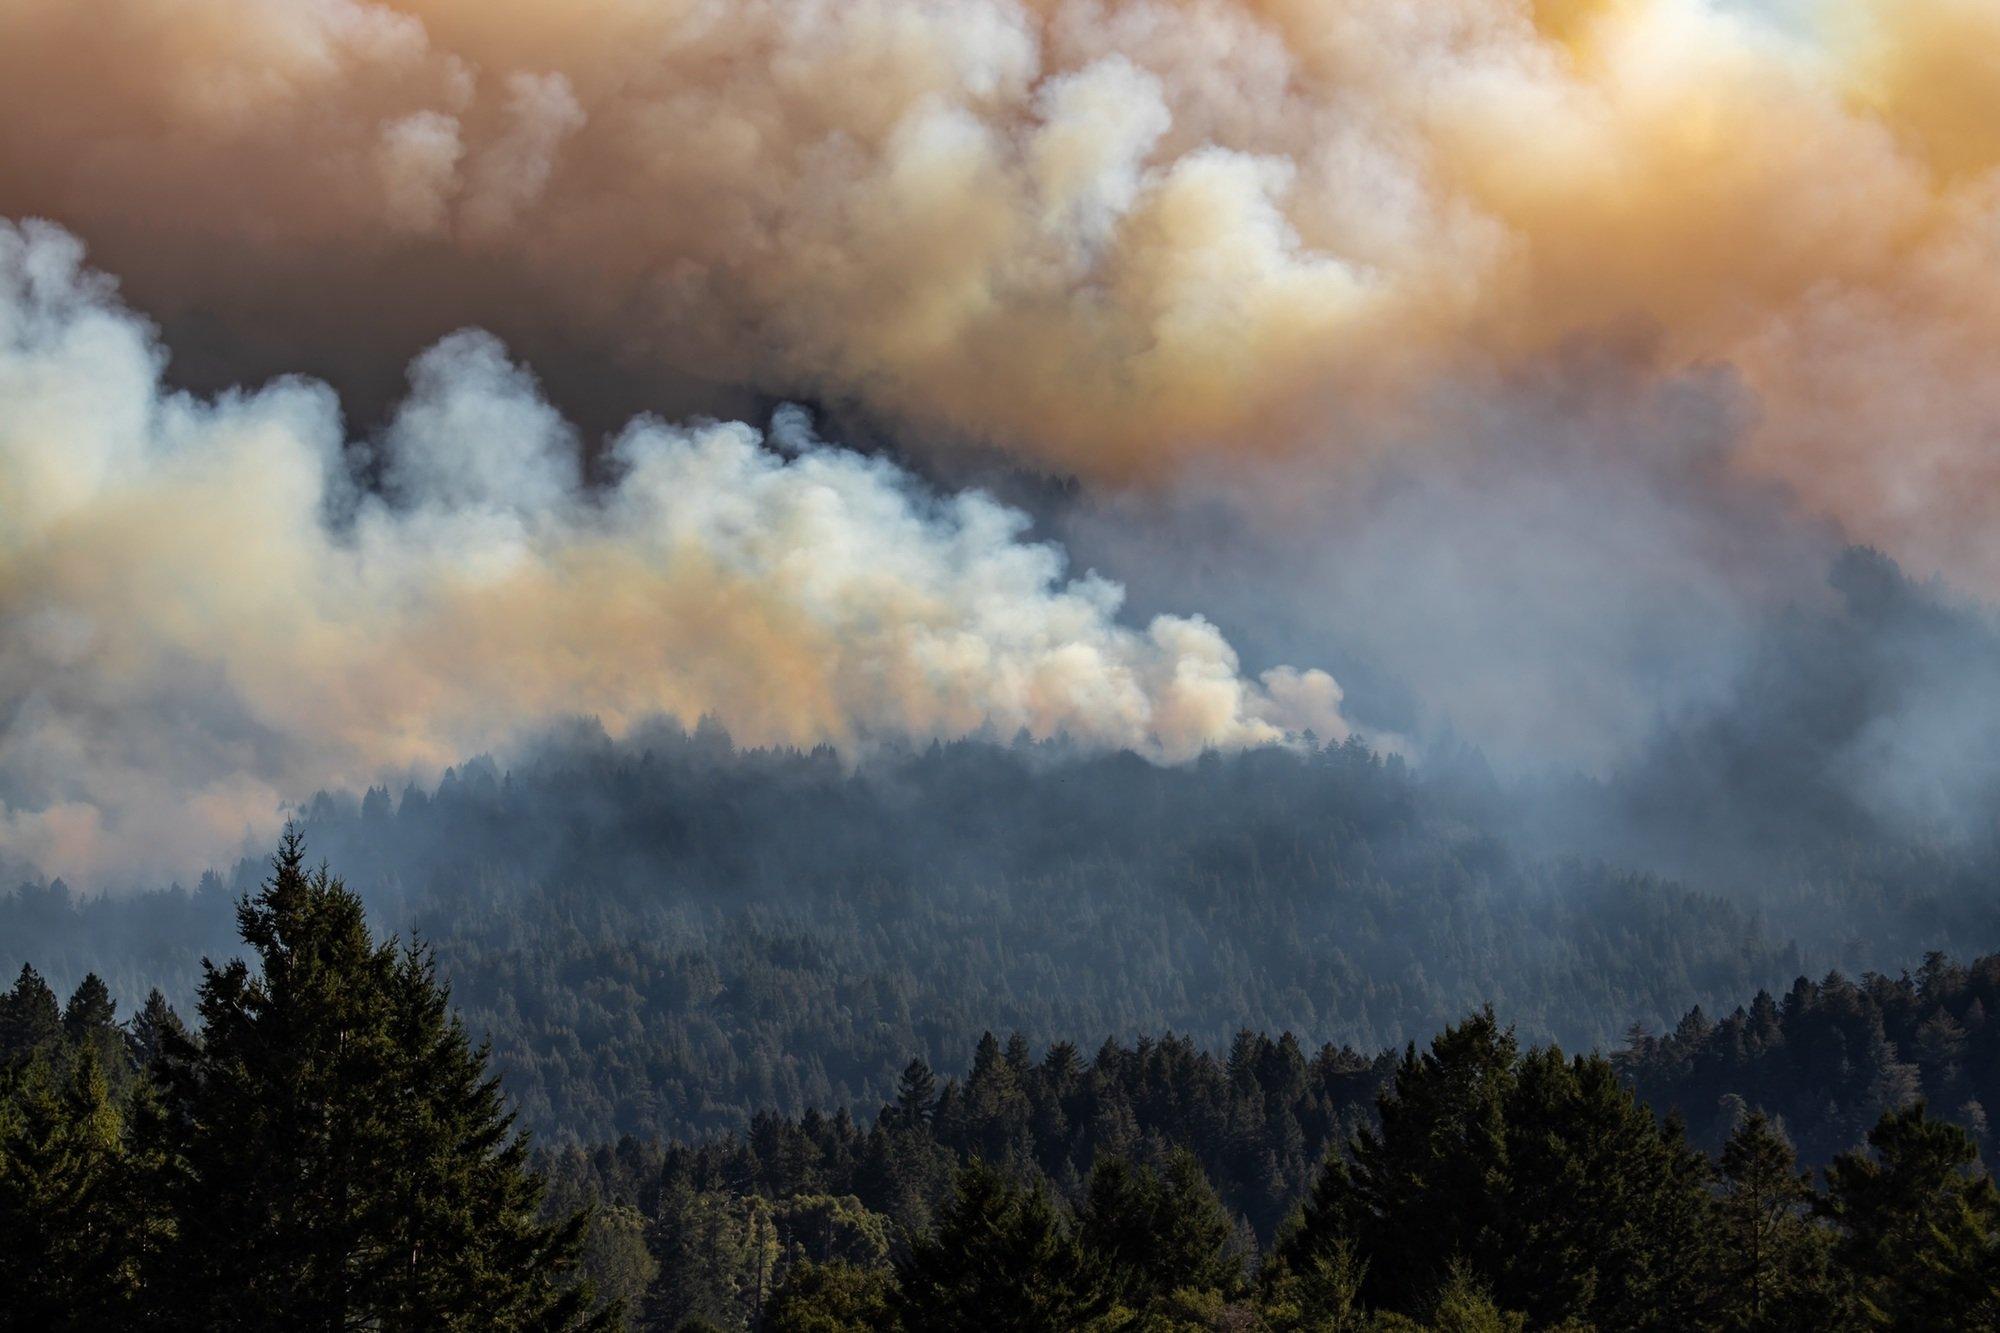 The CZU Lightning Complex fire, as seen from La Honda, California, on August 19, 2020.